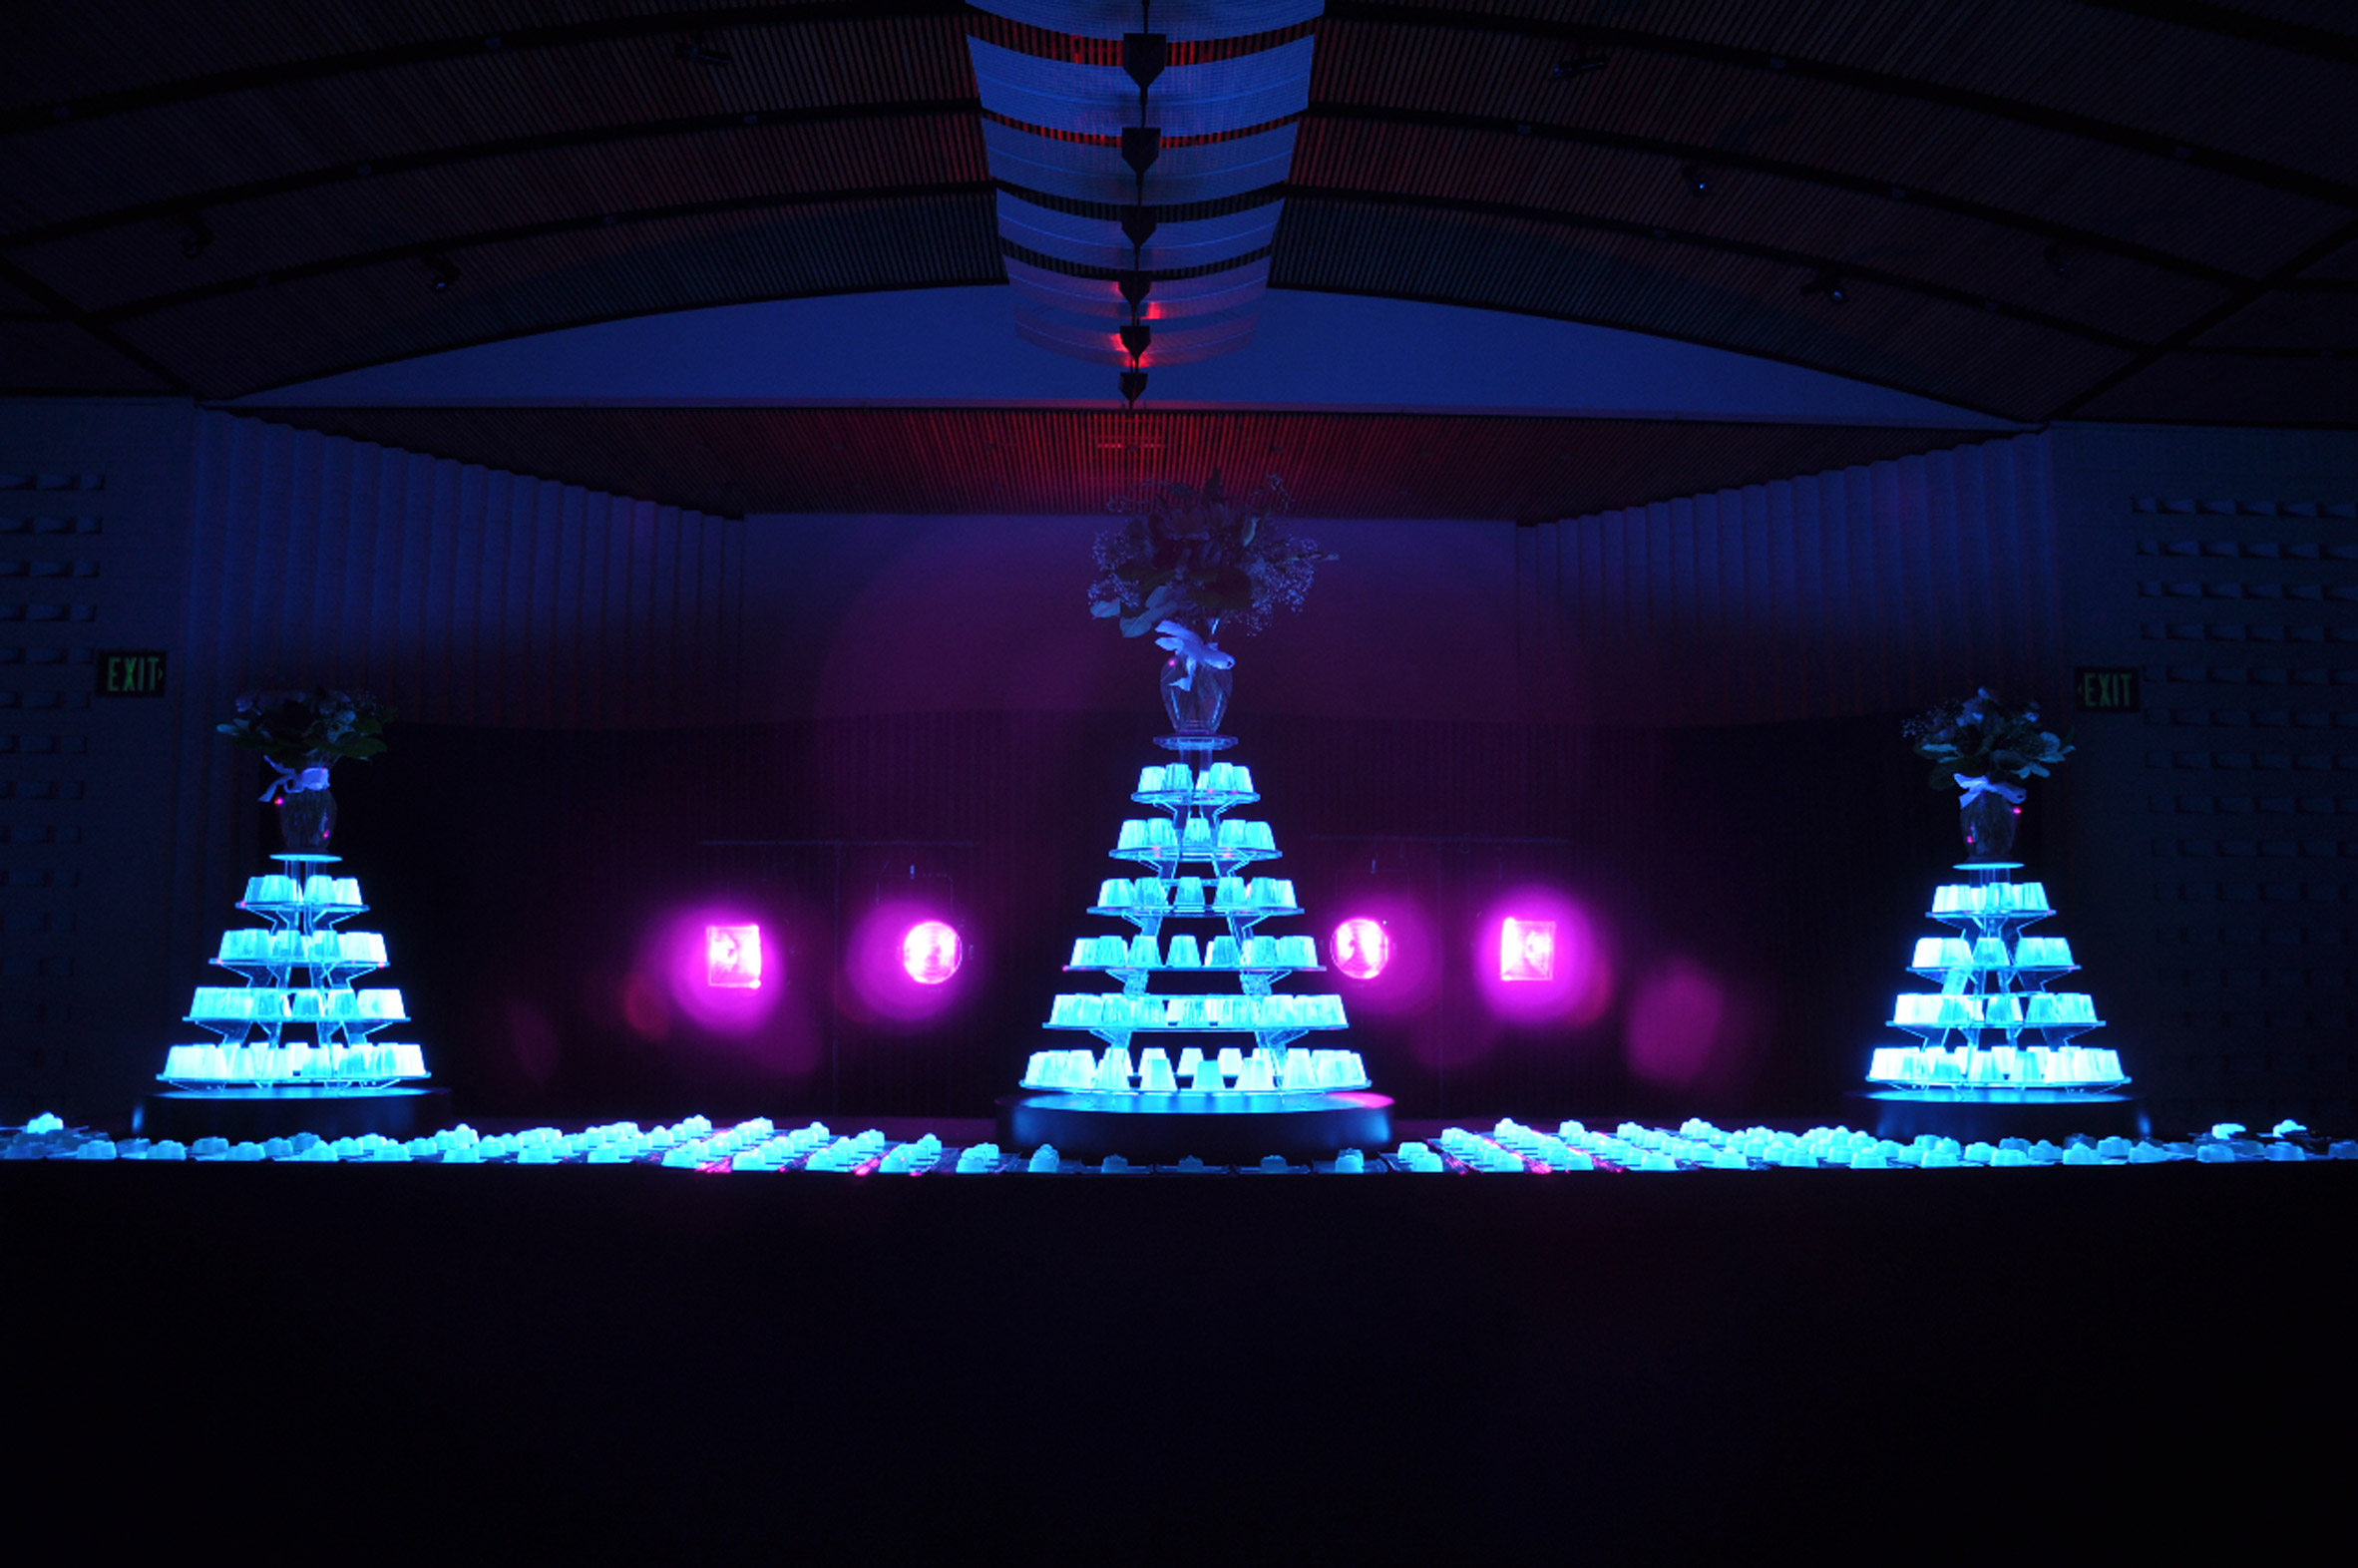 Bompas & Parr jelly installation